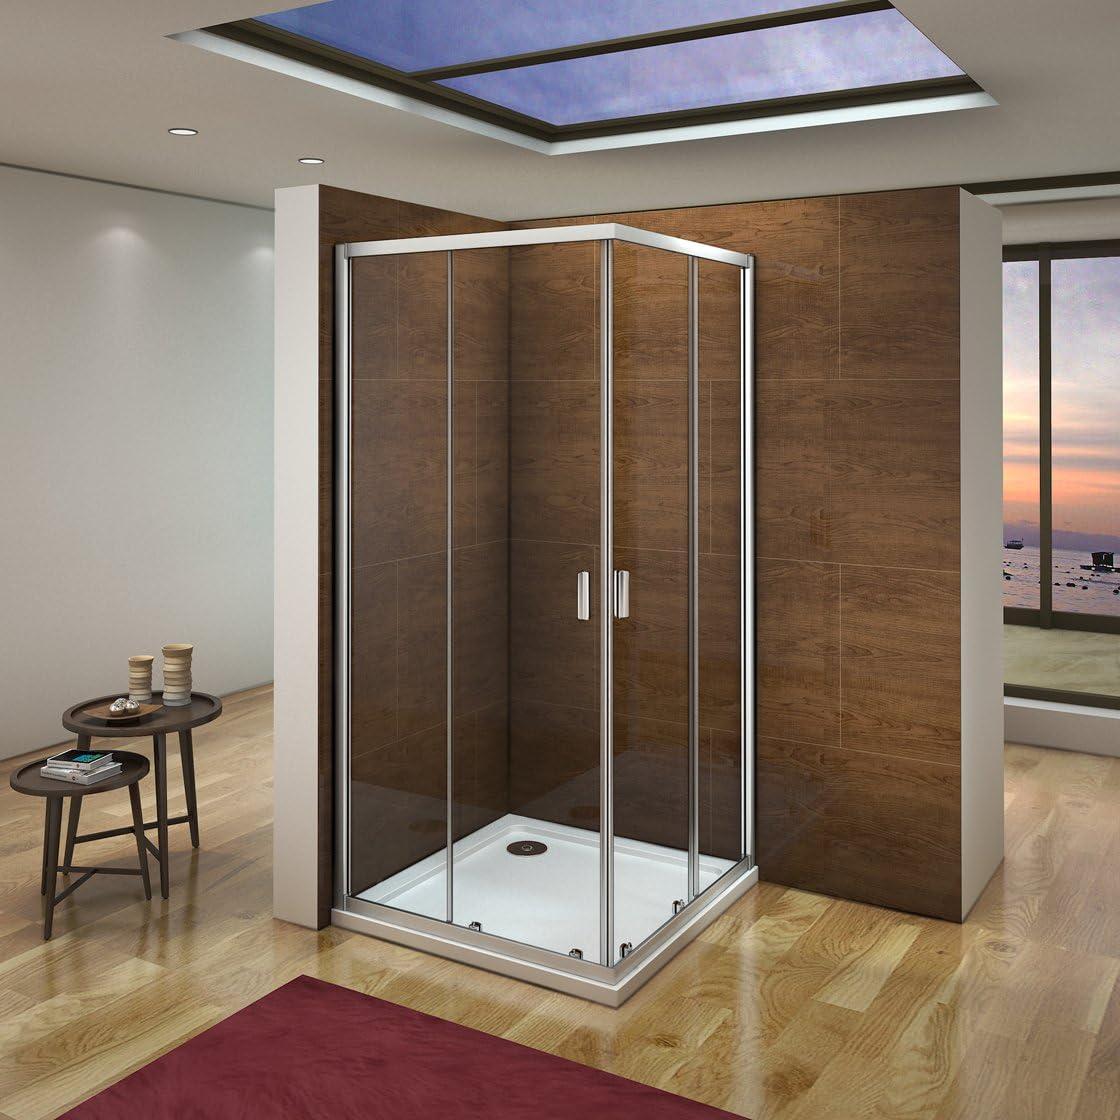 Cabina de ducha mampara de ducha corredera puerta 6mm Easyclean ...